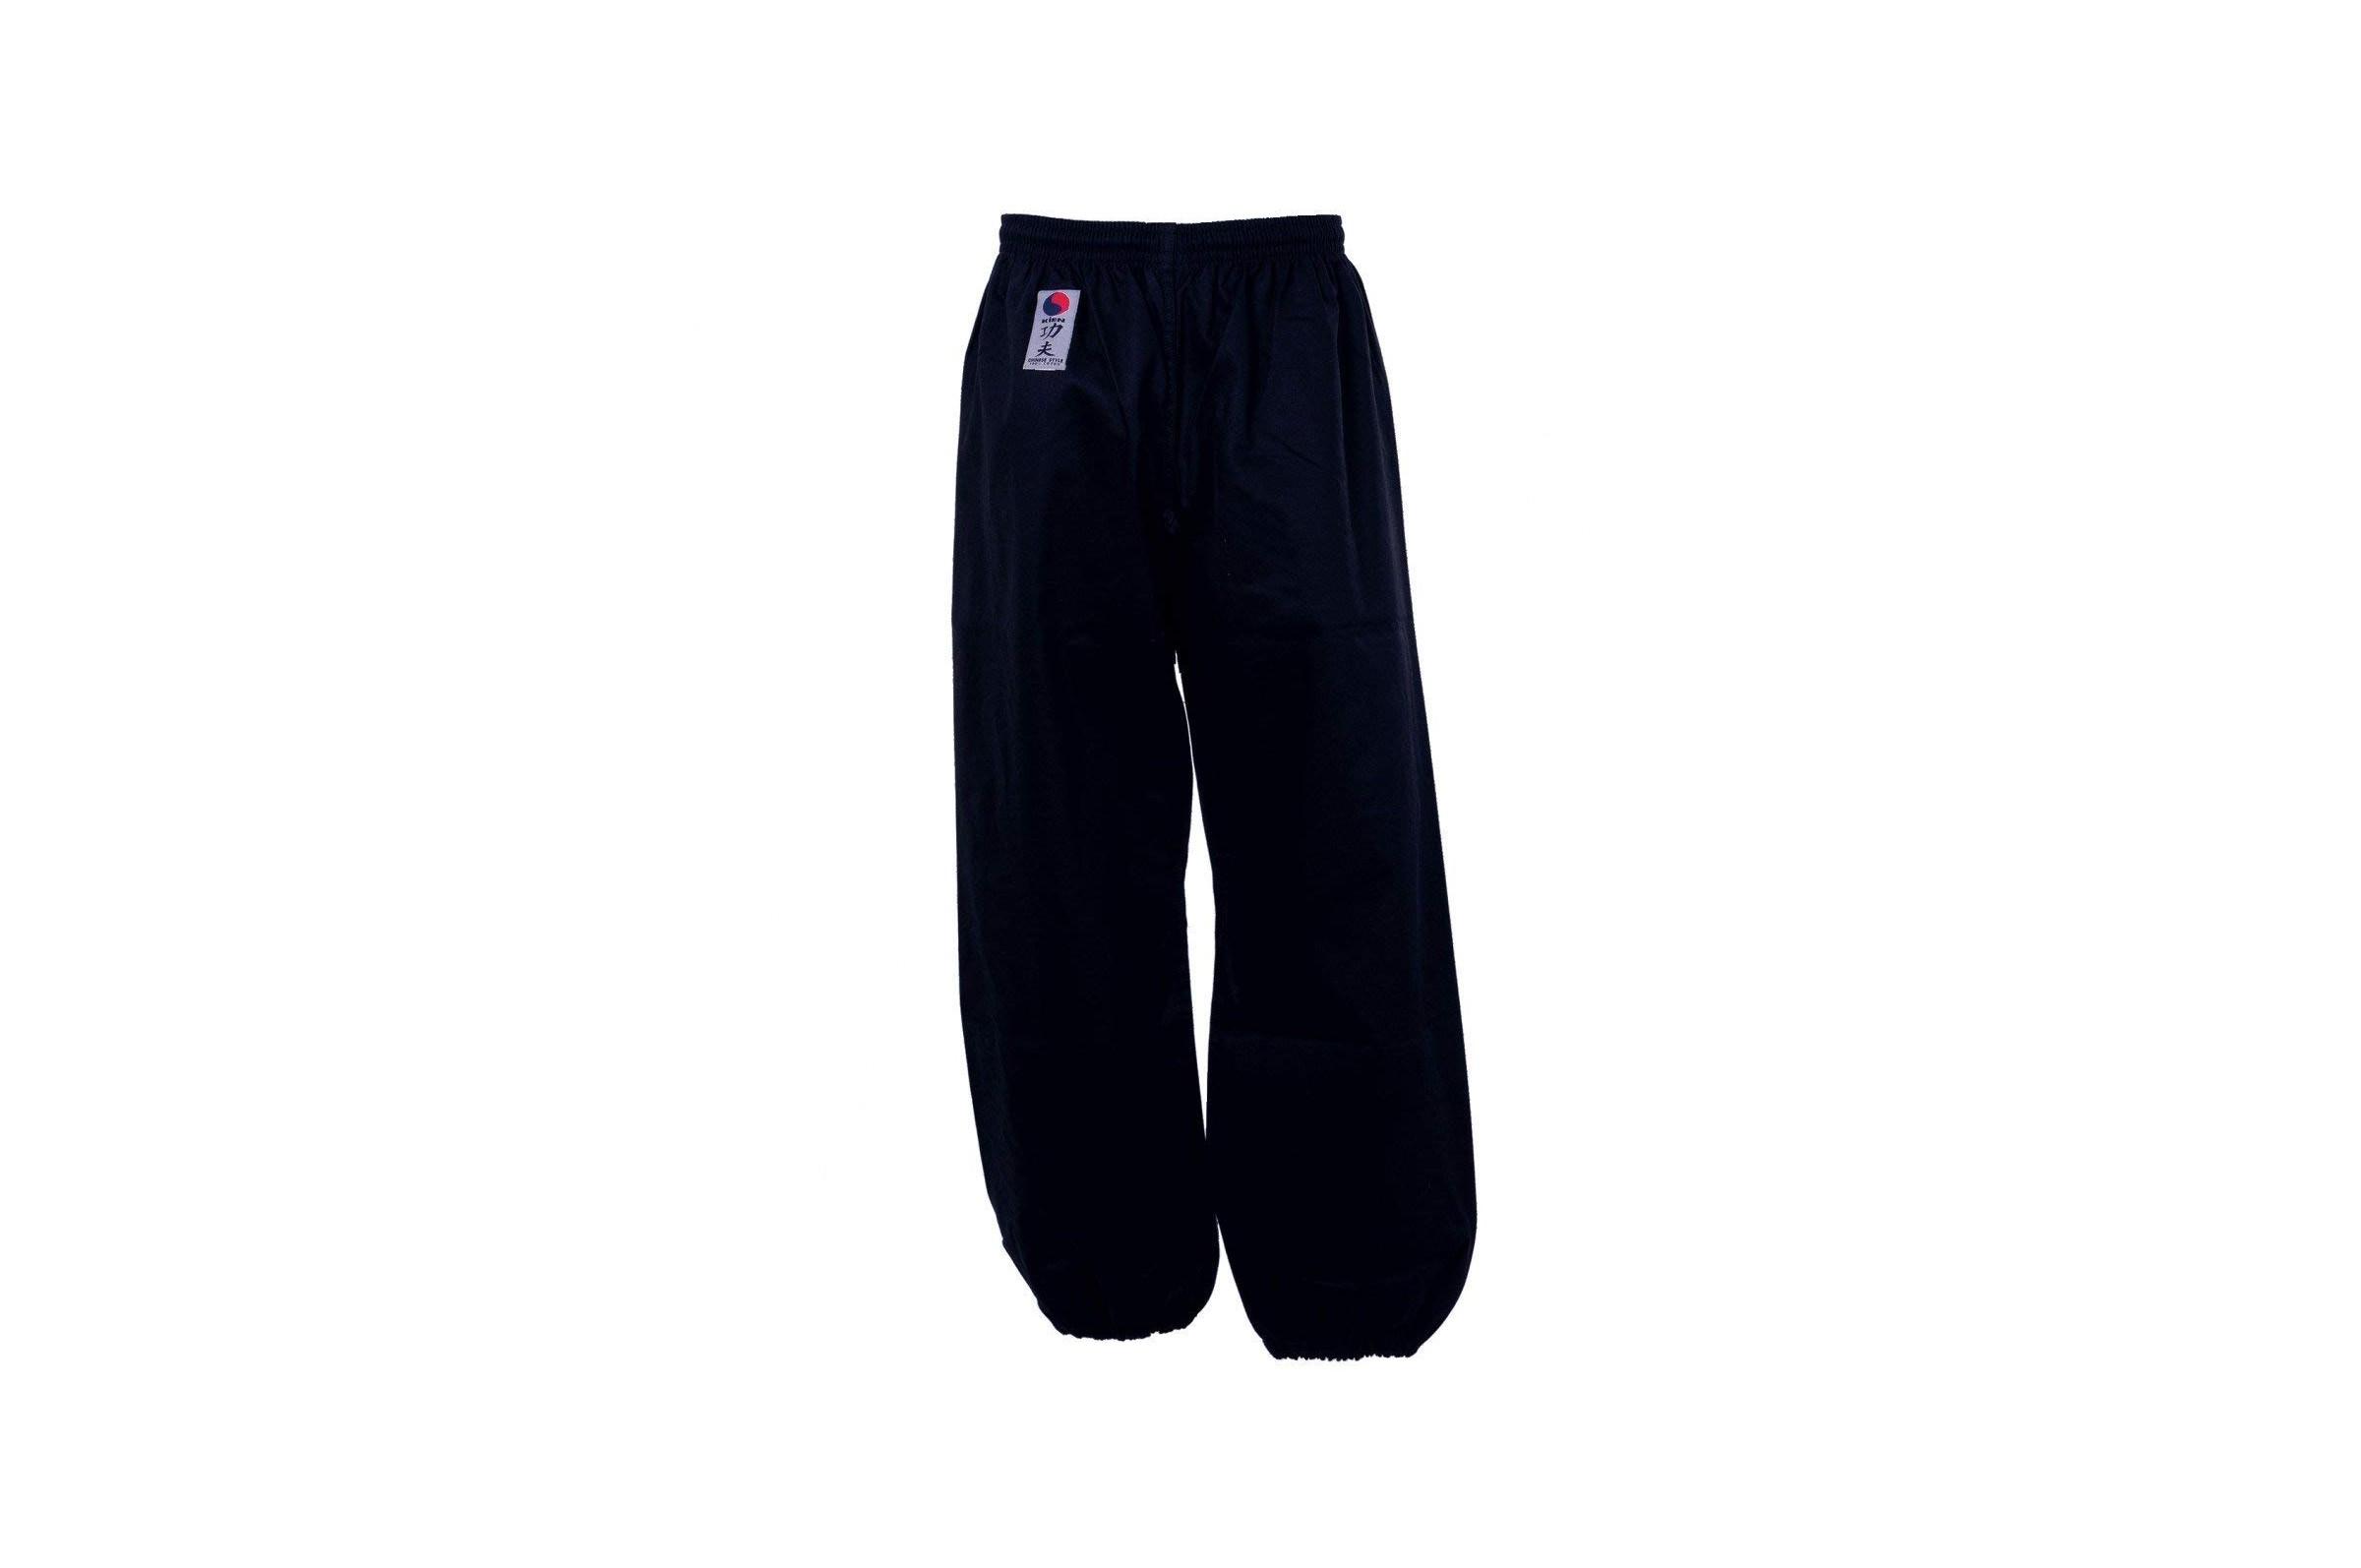 Martial Arts Pants, Very Thick Cotton 8.5oz